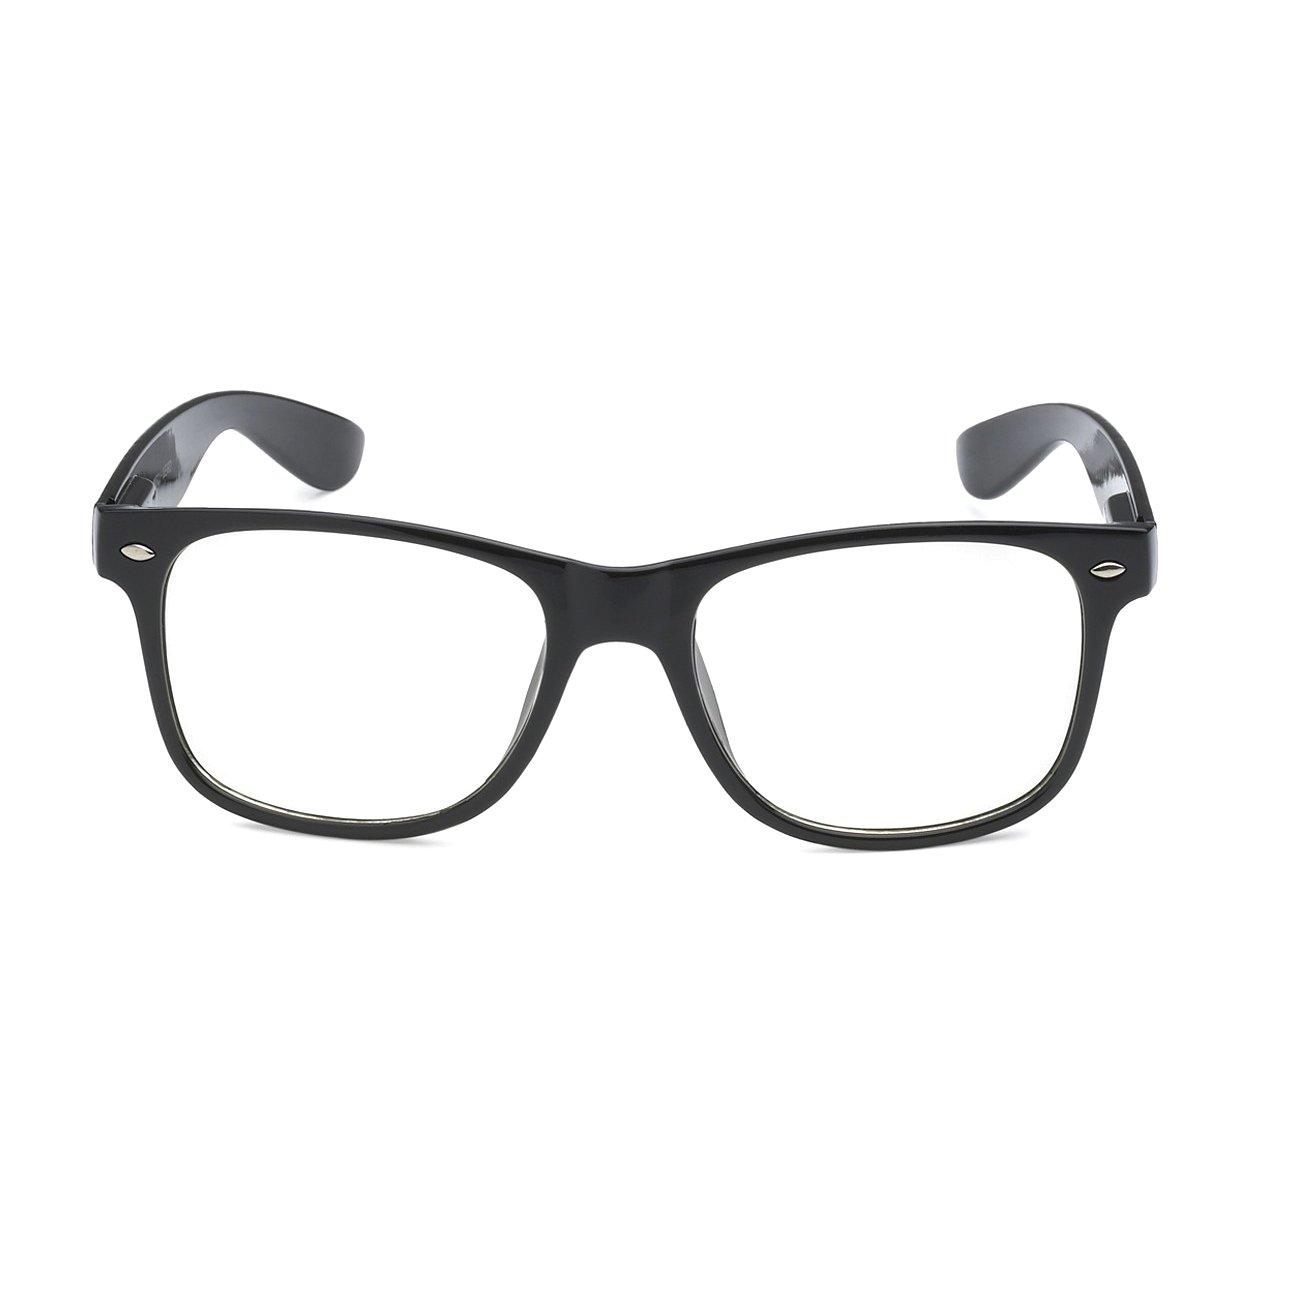 515ff13a4aa7e RETRO NERD Geek Oversized BLACK Framed Spring Temple Clear Lens Eye ...